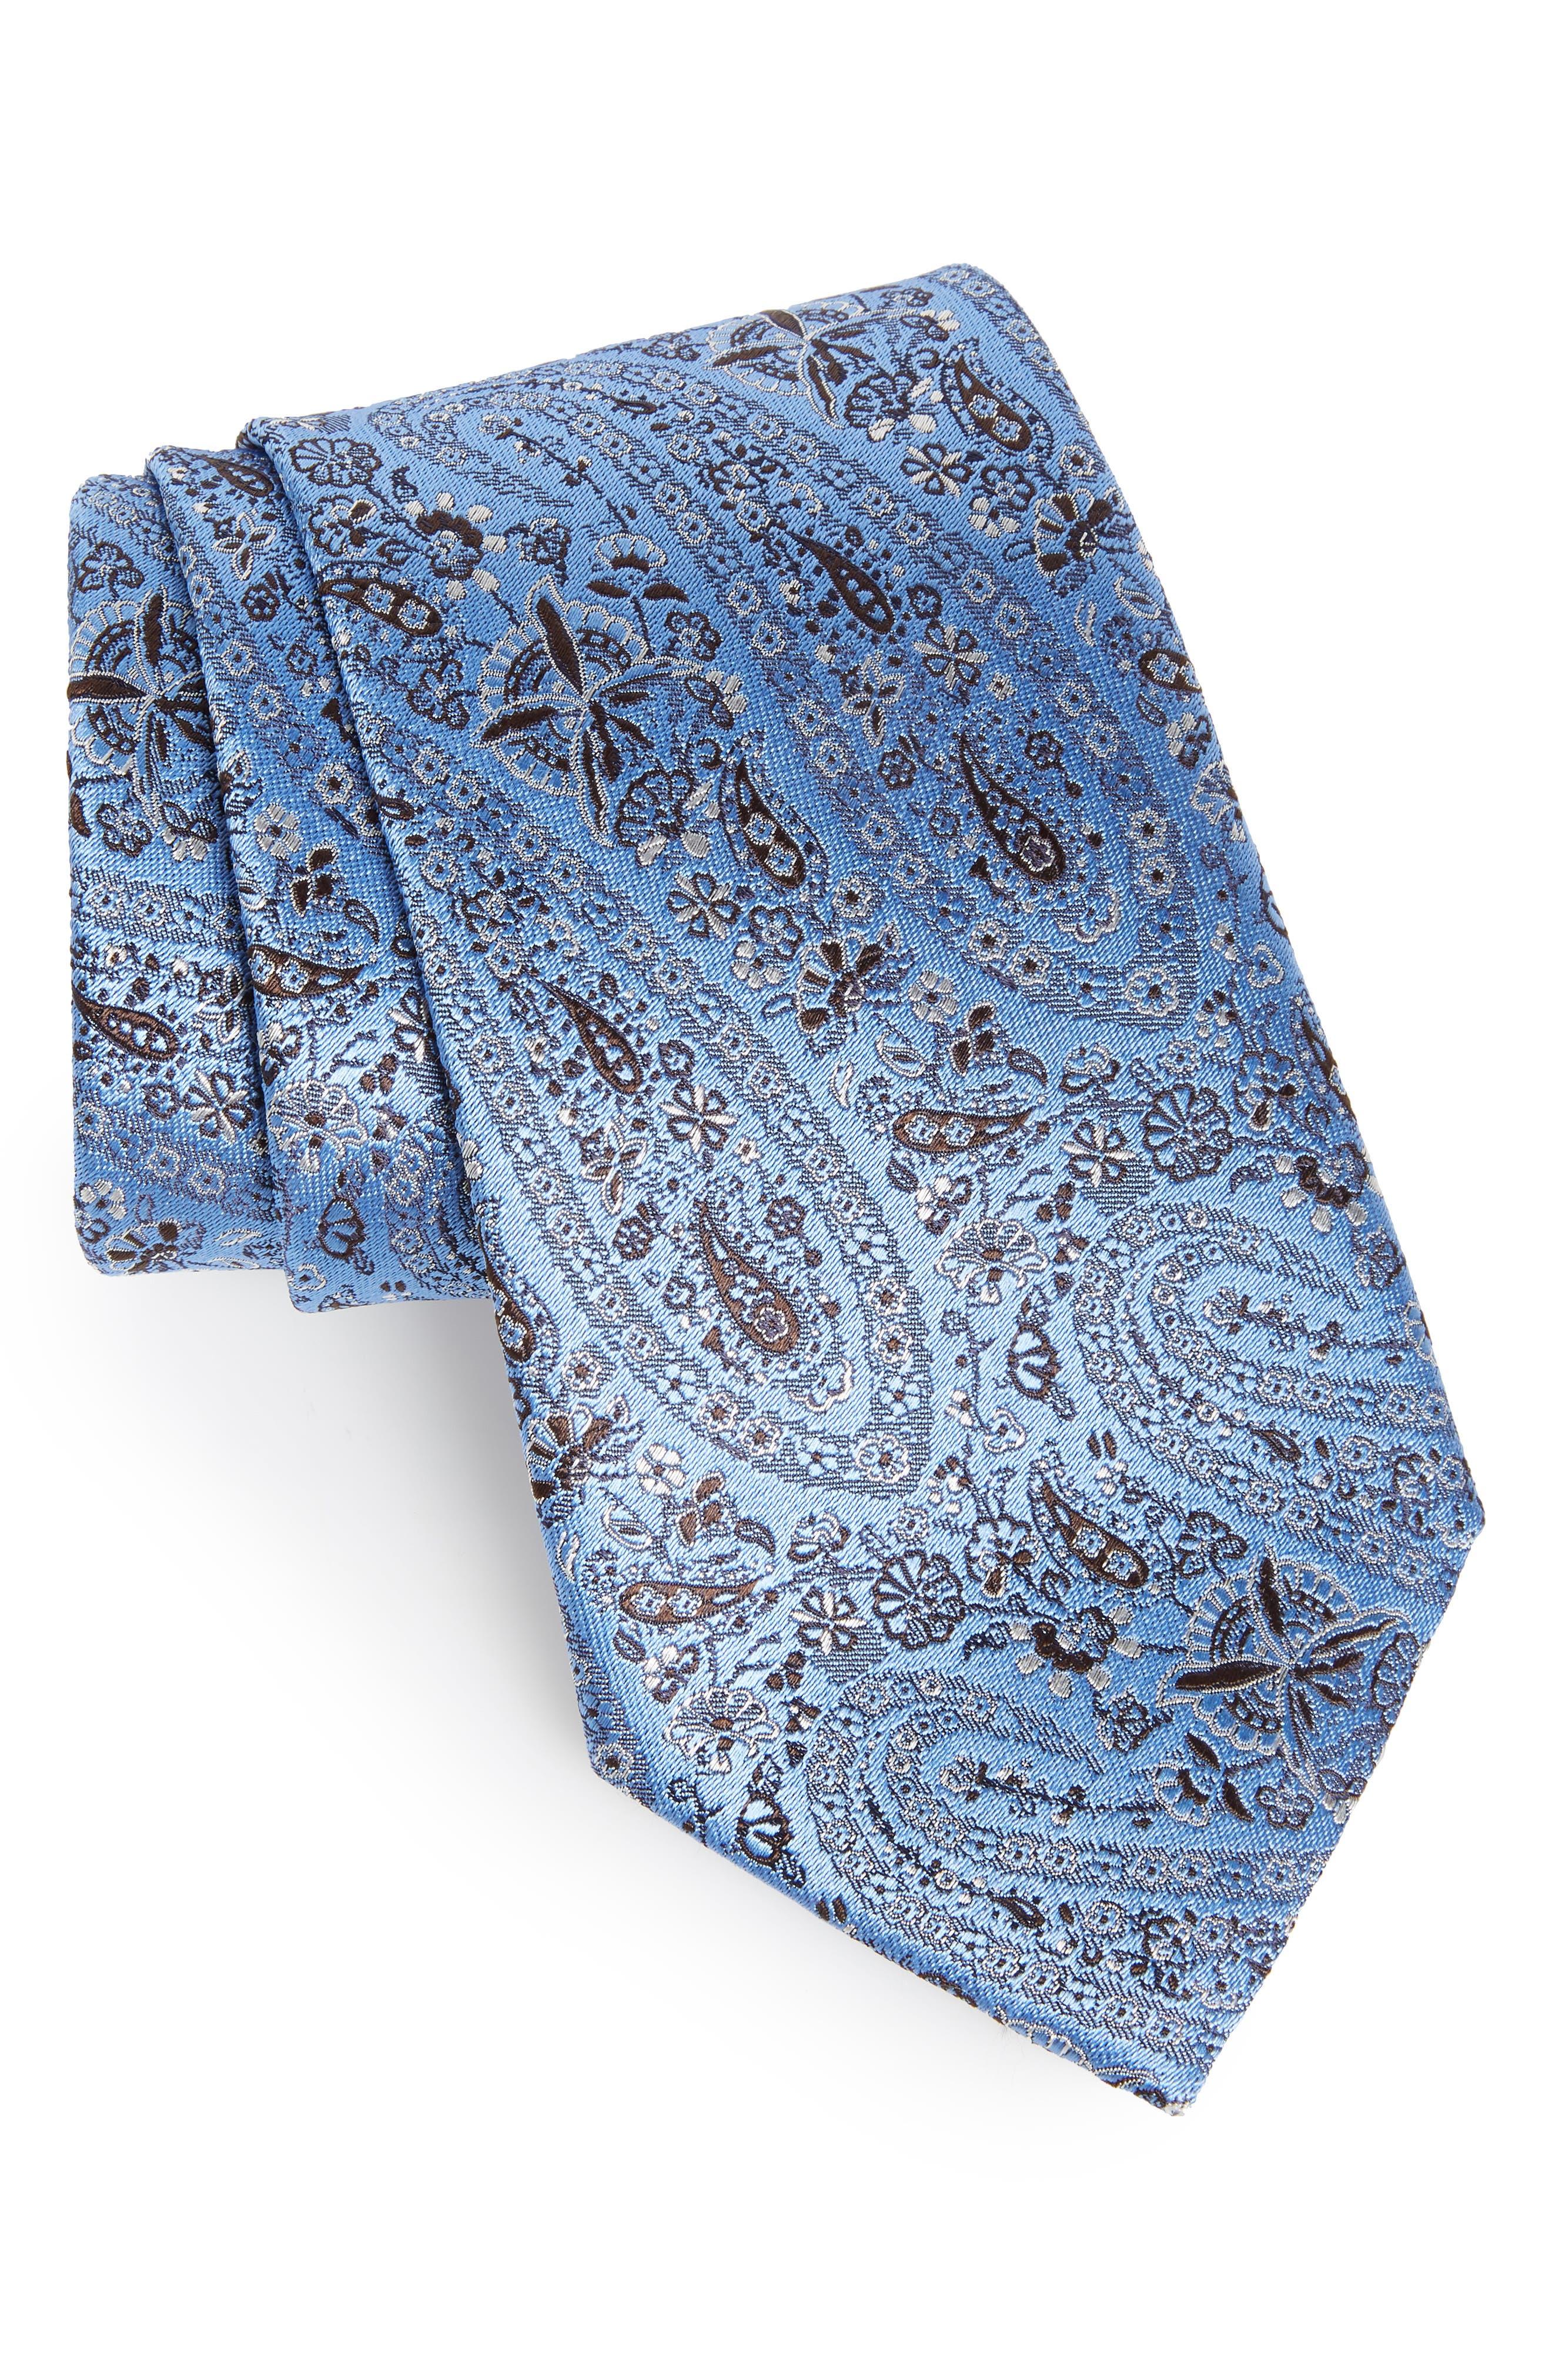 ERMENEGILDO ZEGNA Floral Silk Tie, Main, color, 438